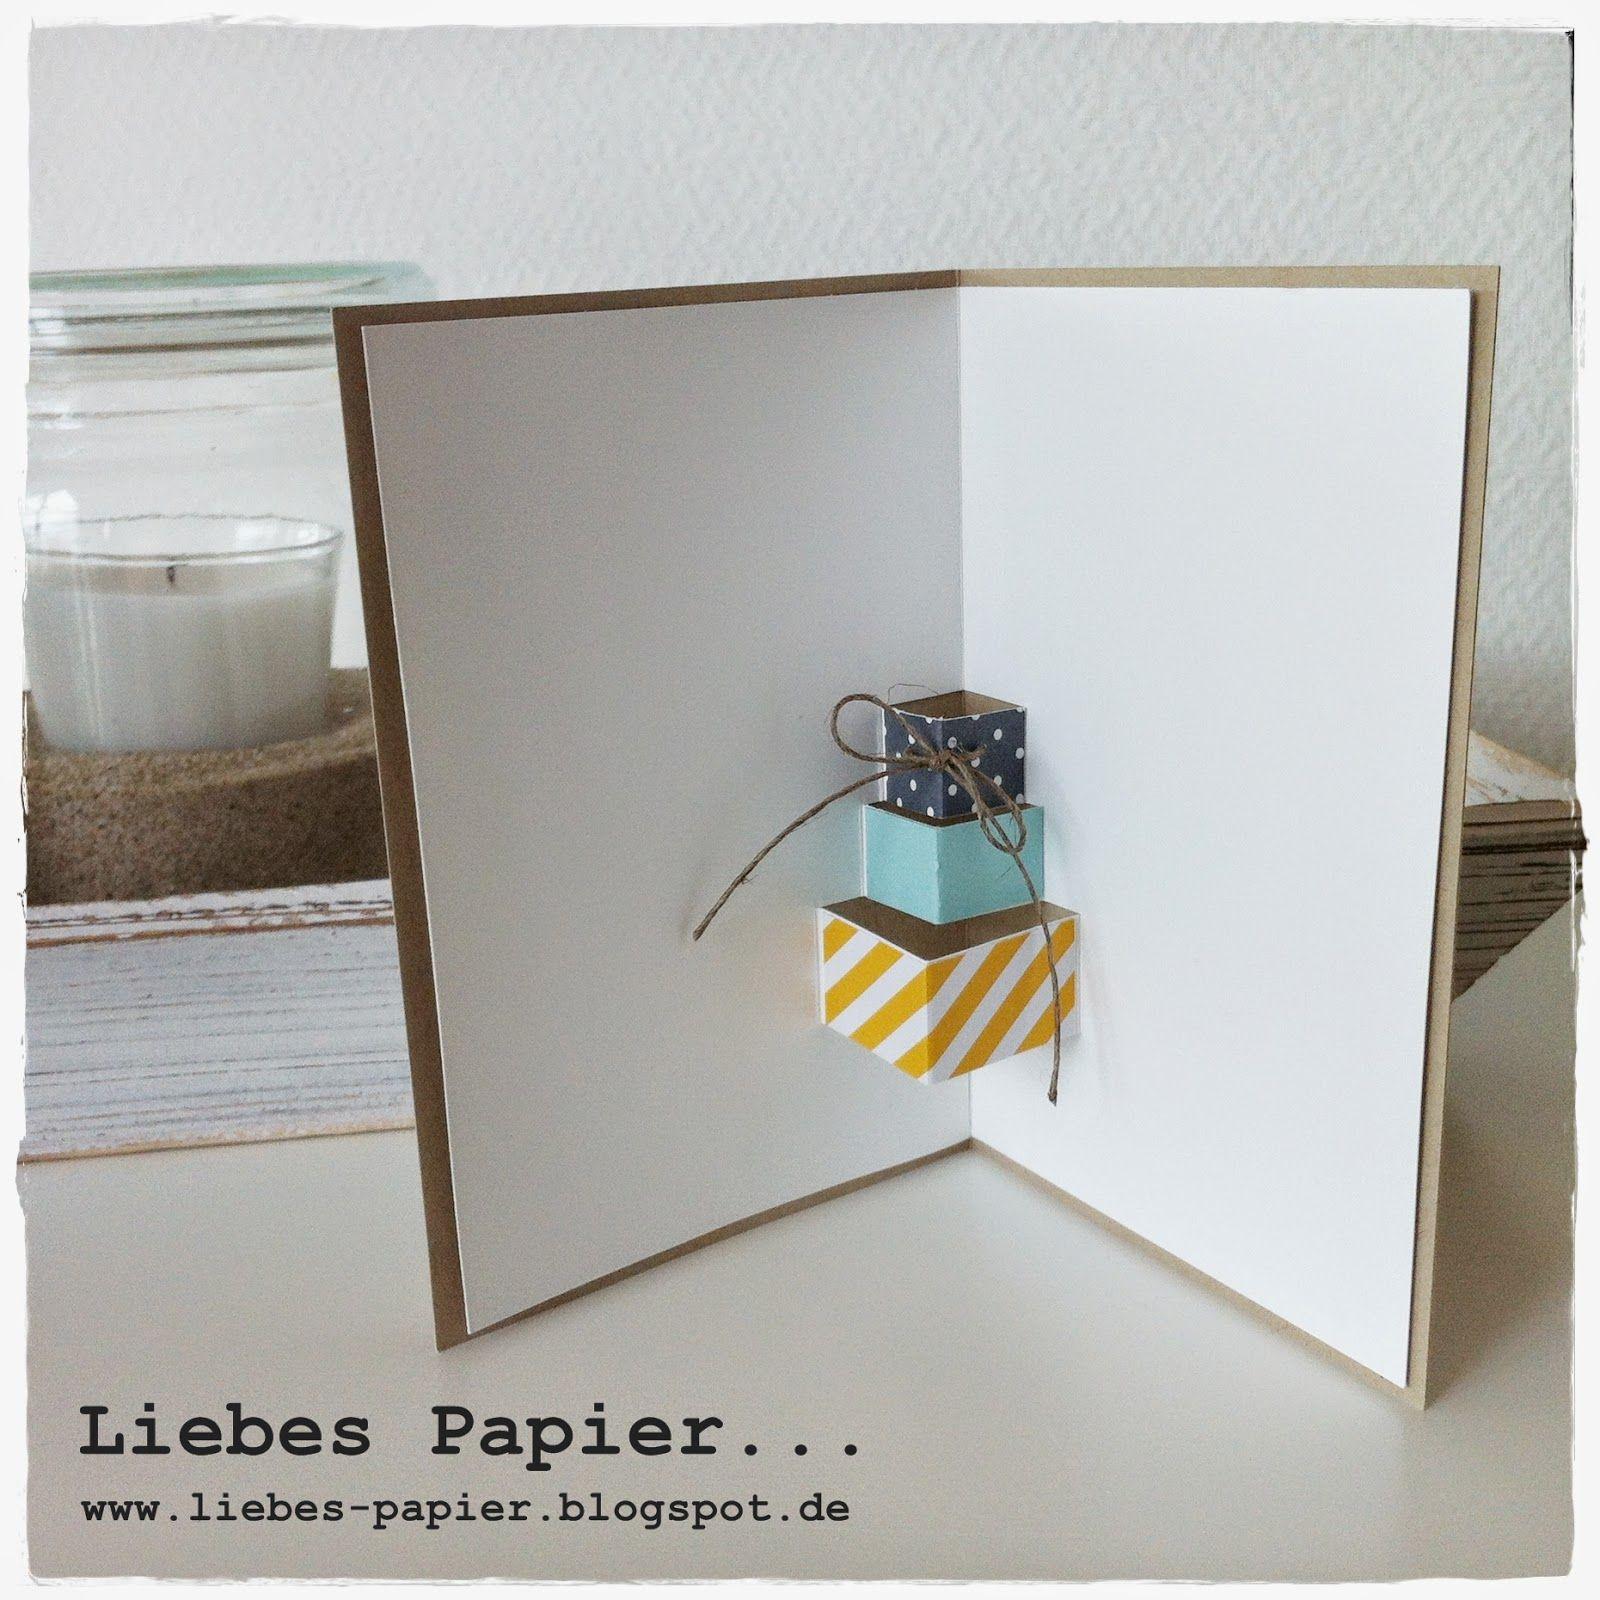 liebes papier anleitung zur torte papier. Black Bedroom Furniture Sets. Home Design Ideas